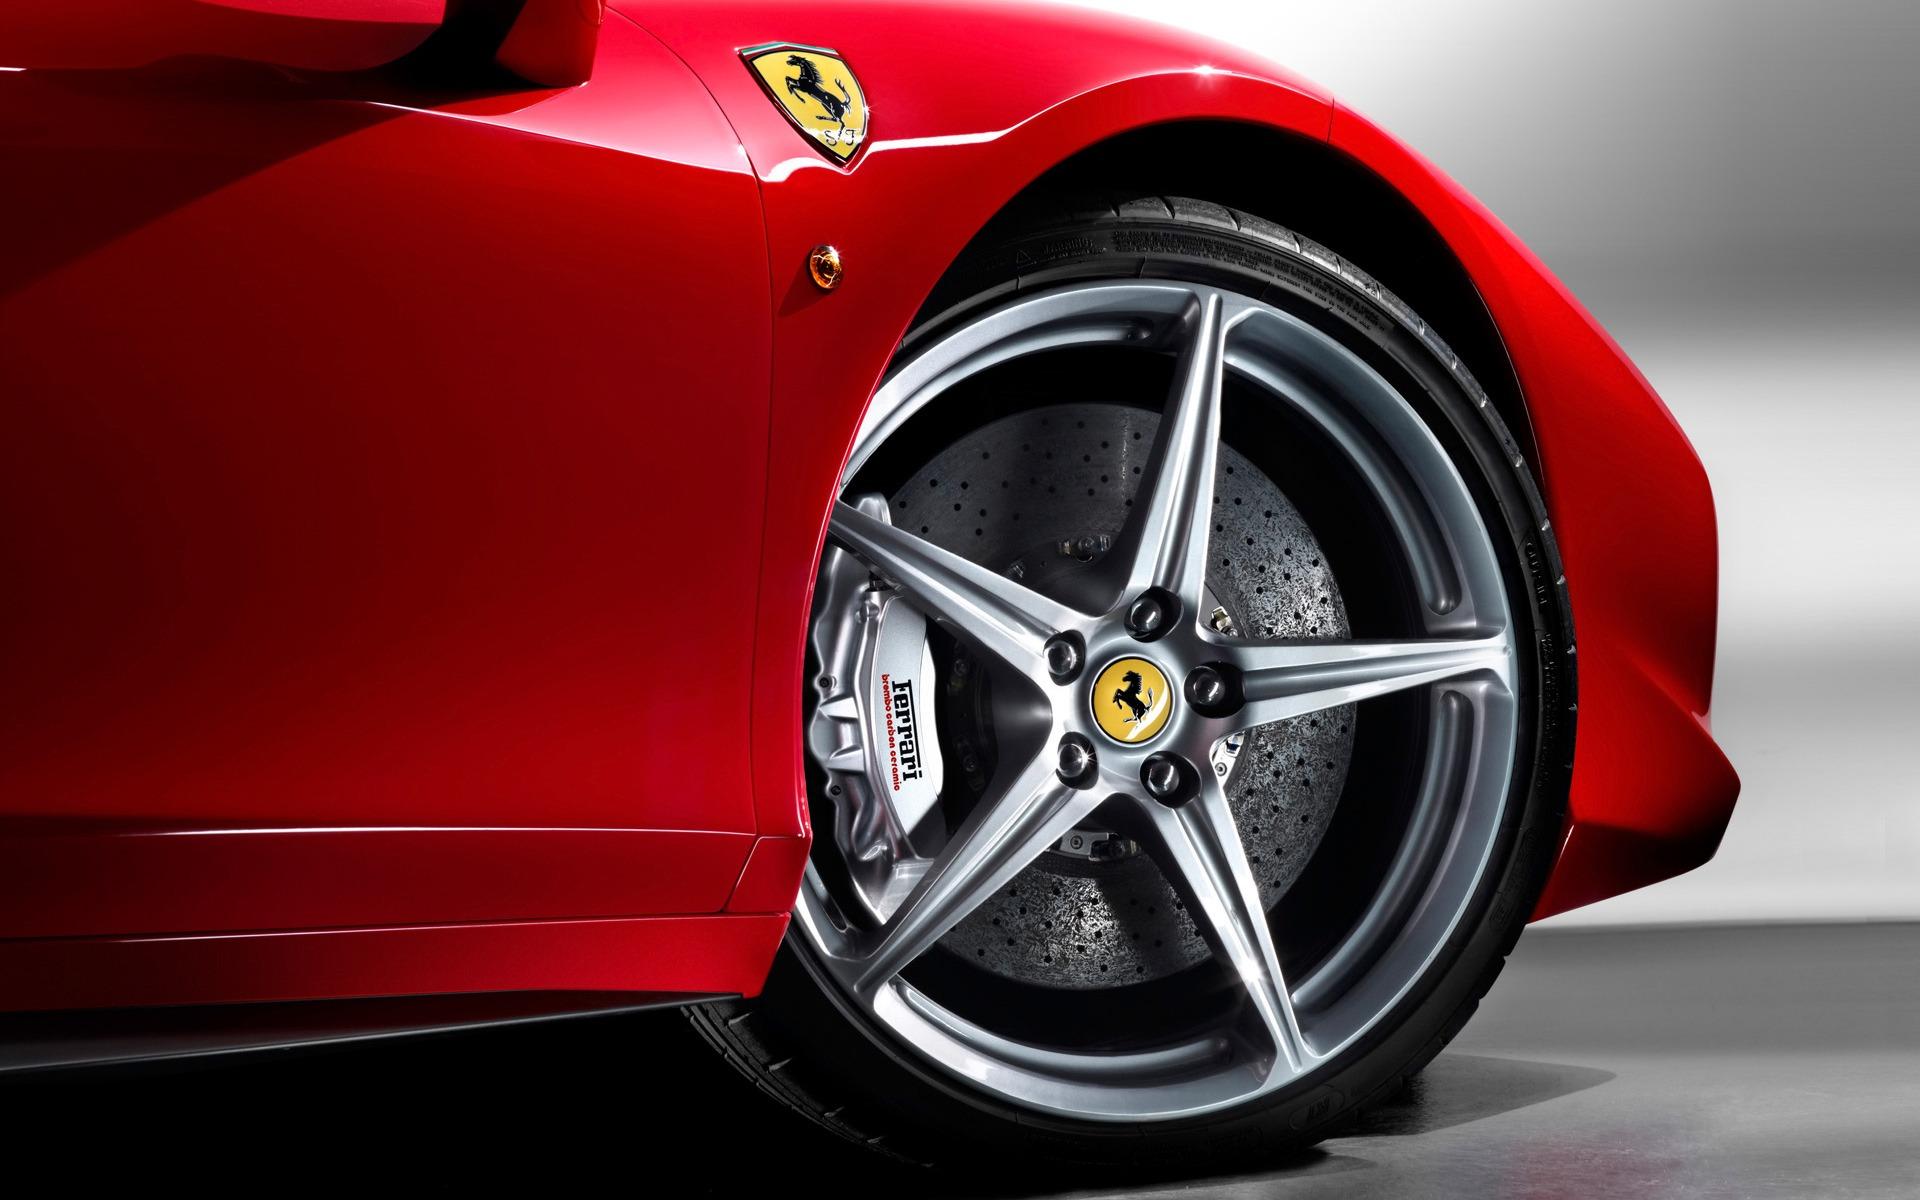 Ferrari Cars Hd Wallpapers Free Wallpaper Downloads Ferrari 1920x1200